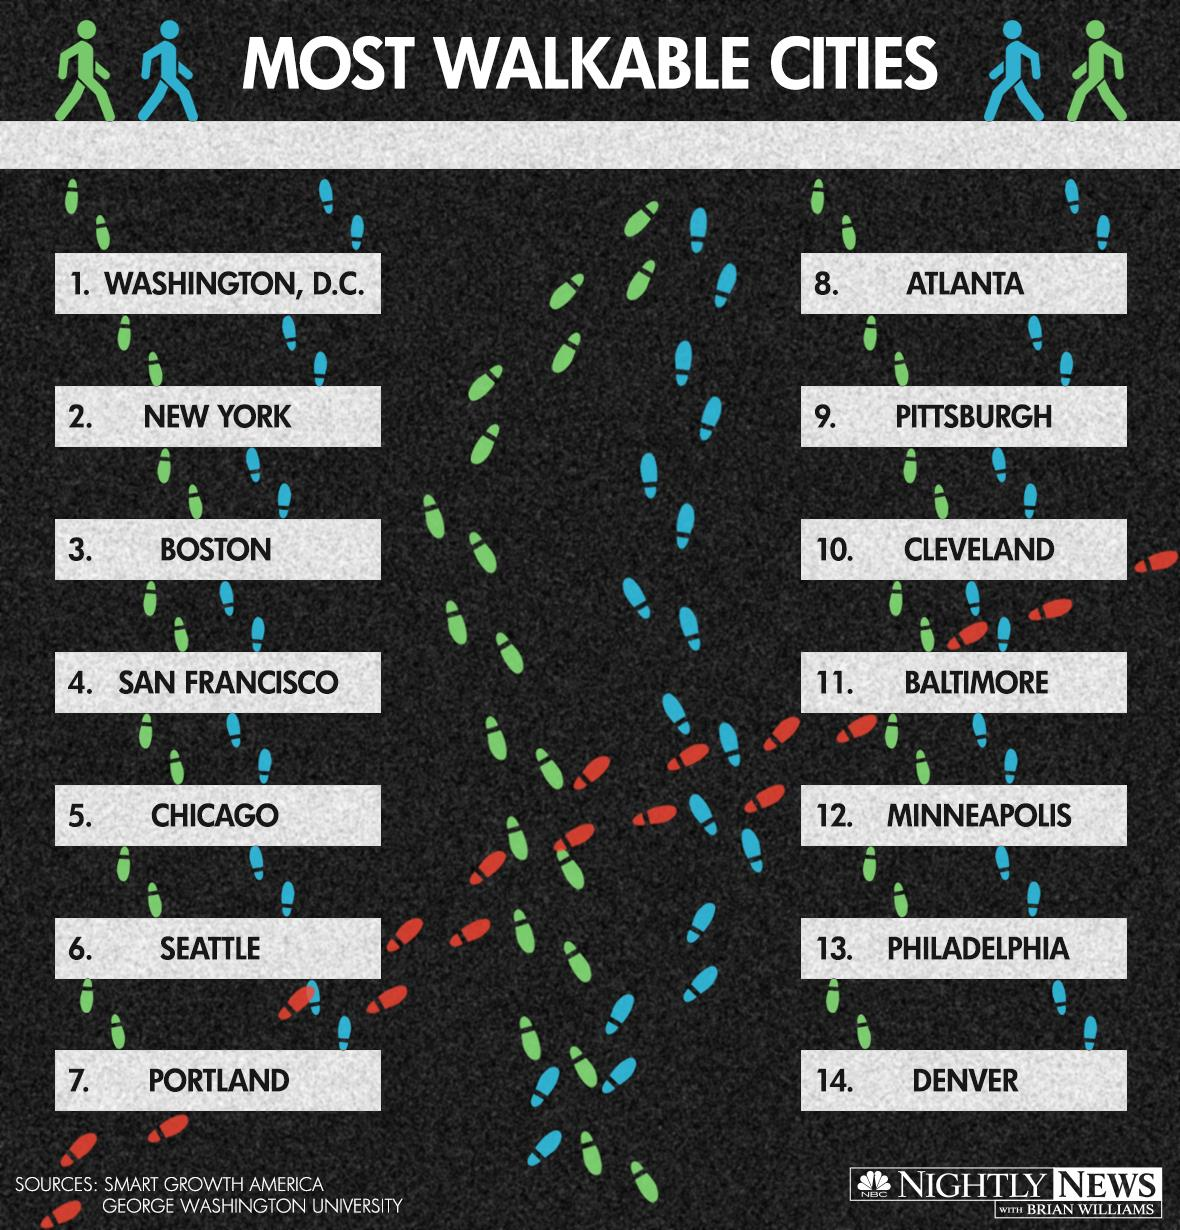 Most walkable cities